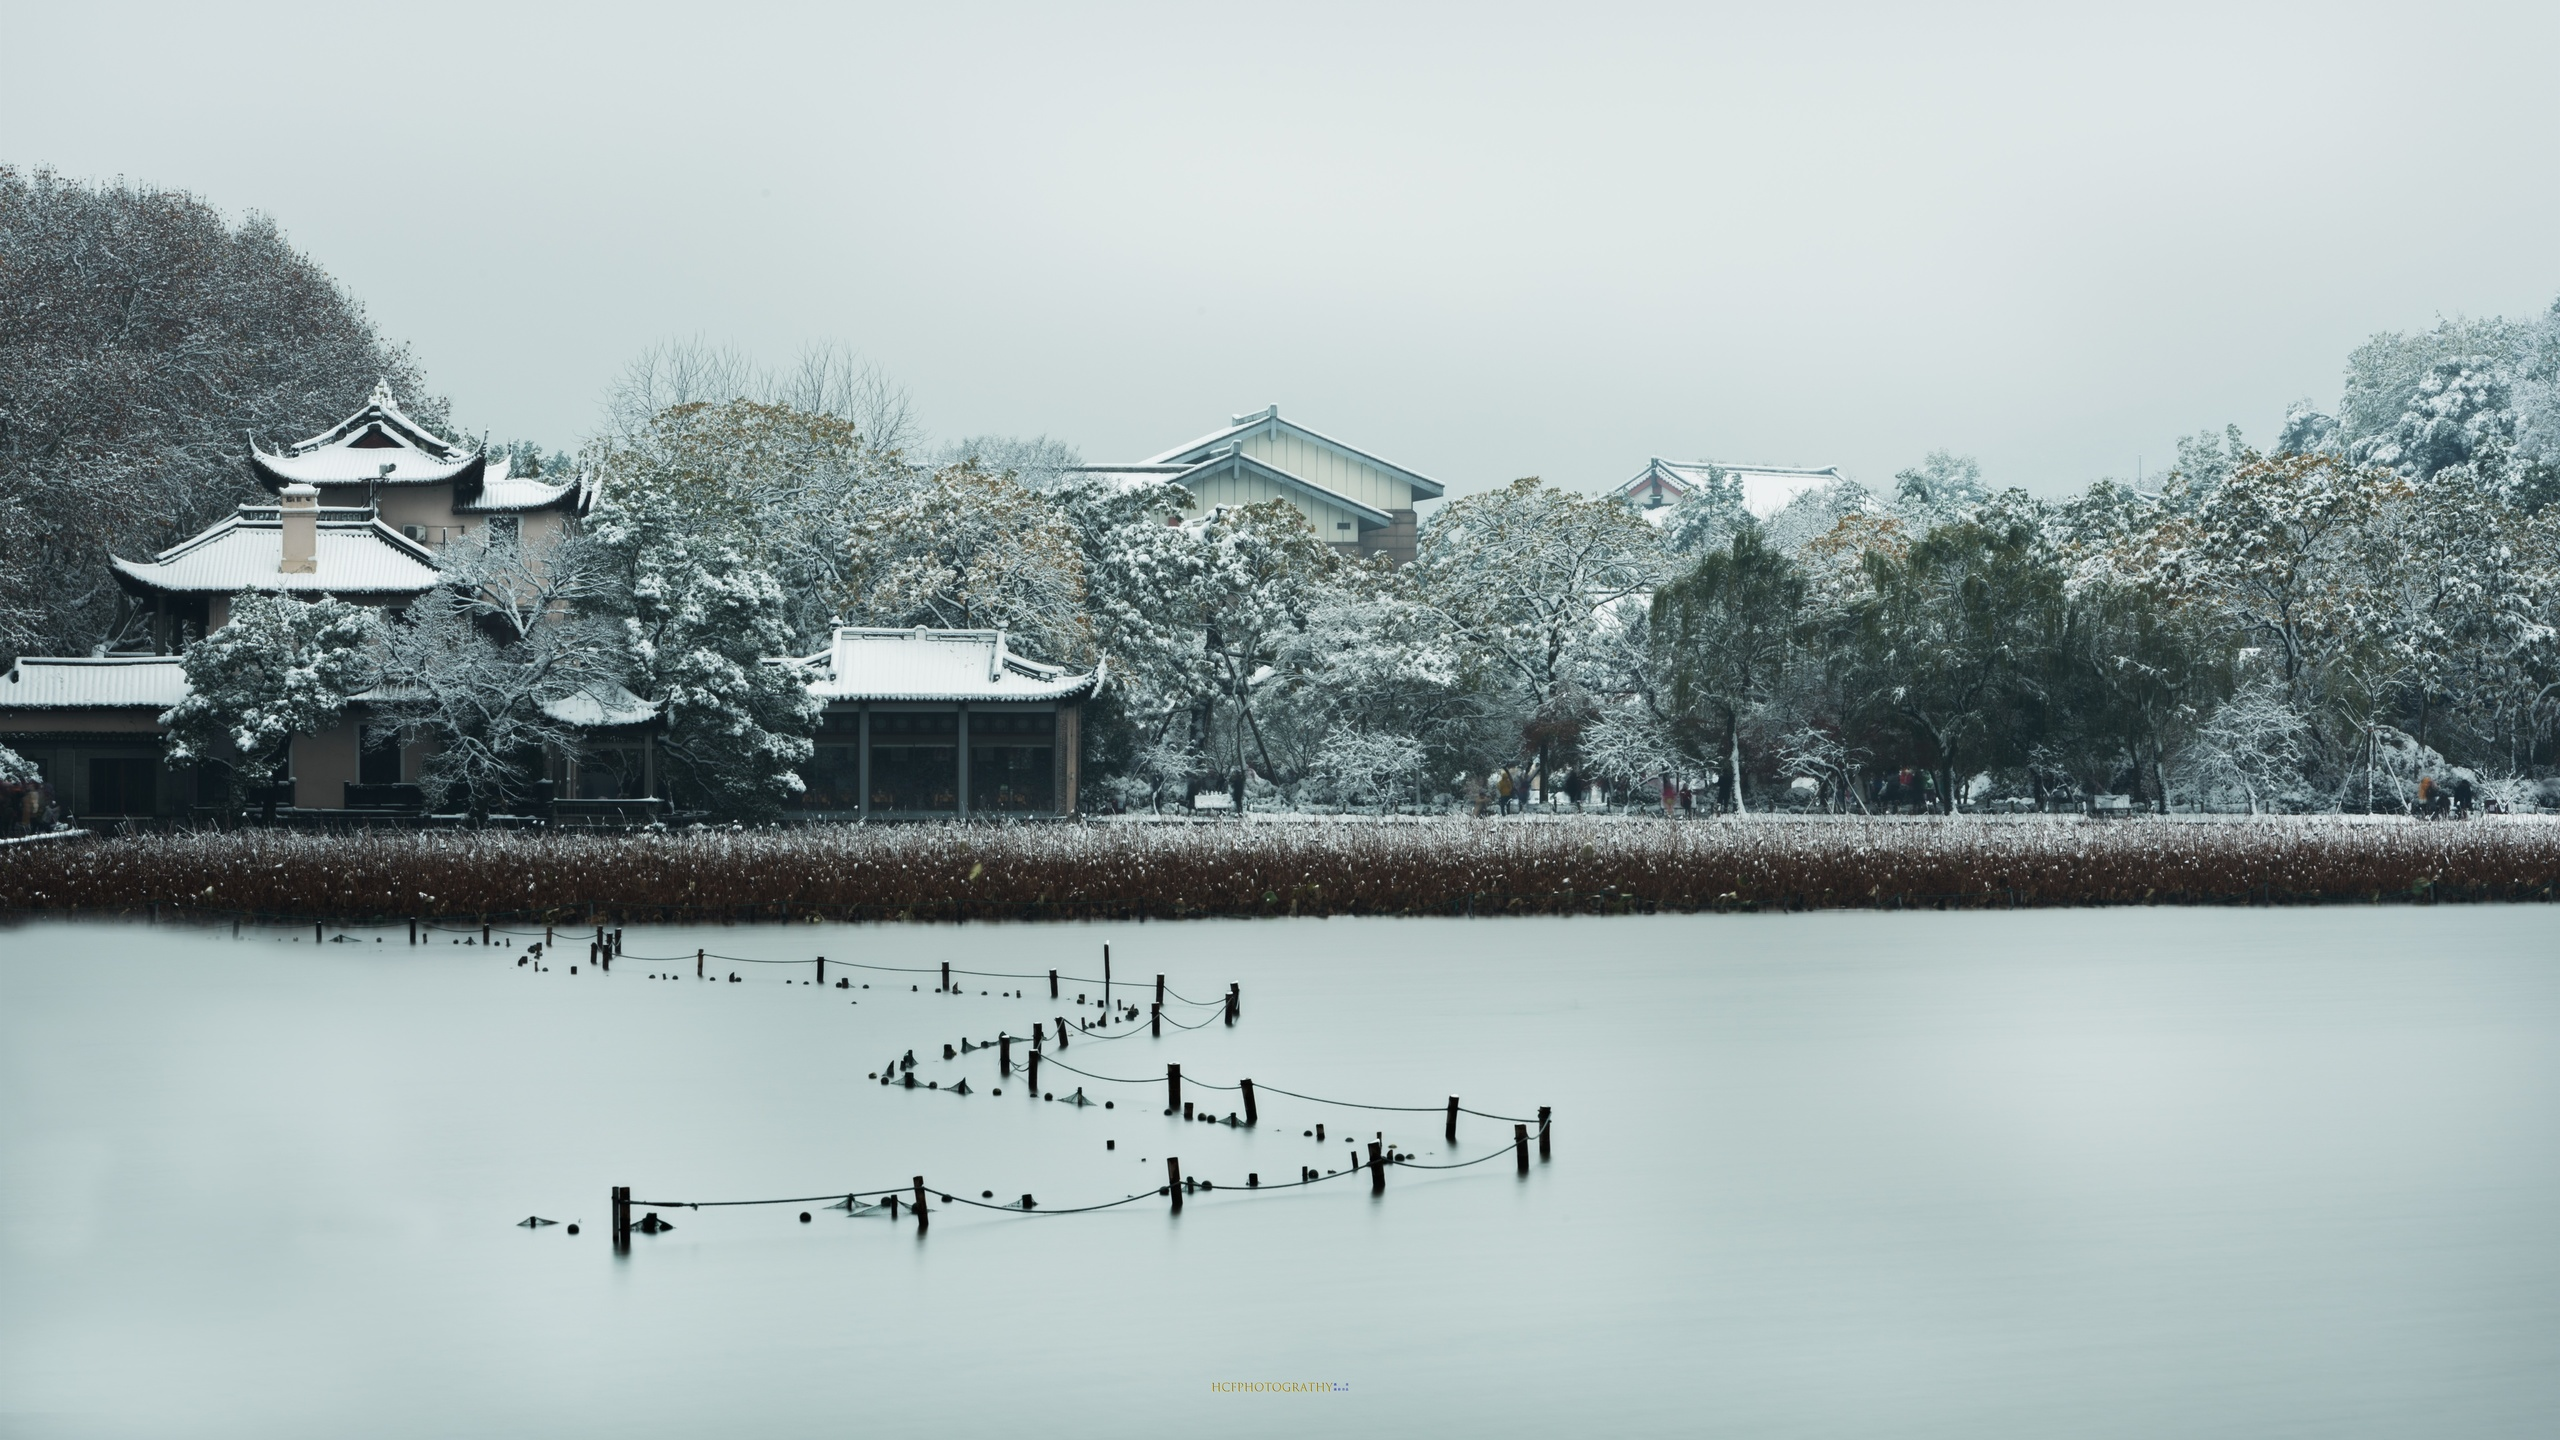 pinghu qiuyue, дома, деревья, снег, зима, западное озеро, ханчжоу, китай